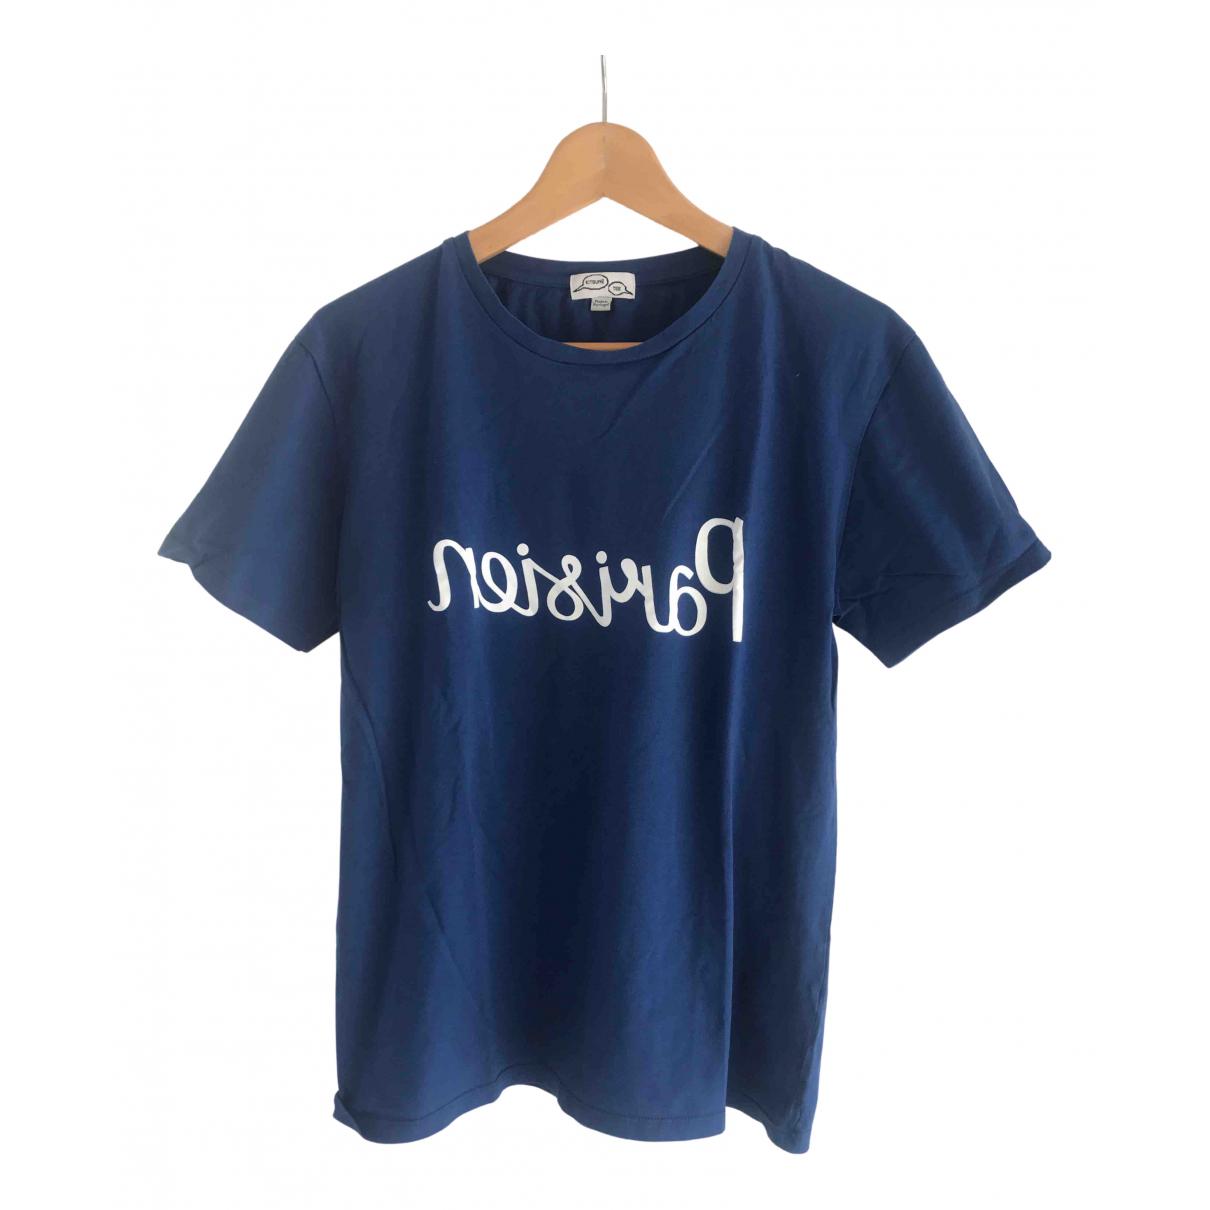 Maison Kitsune - Tee shirts   pour homme en coton - bleu